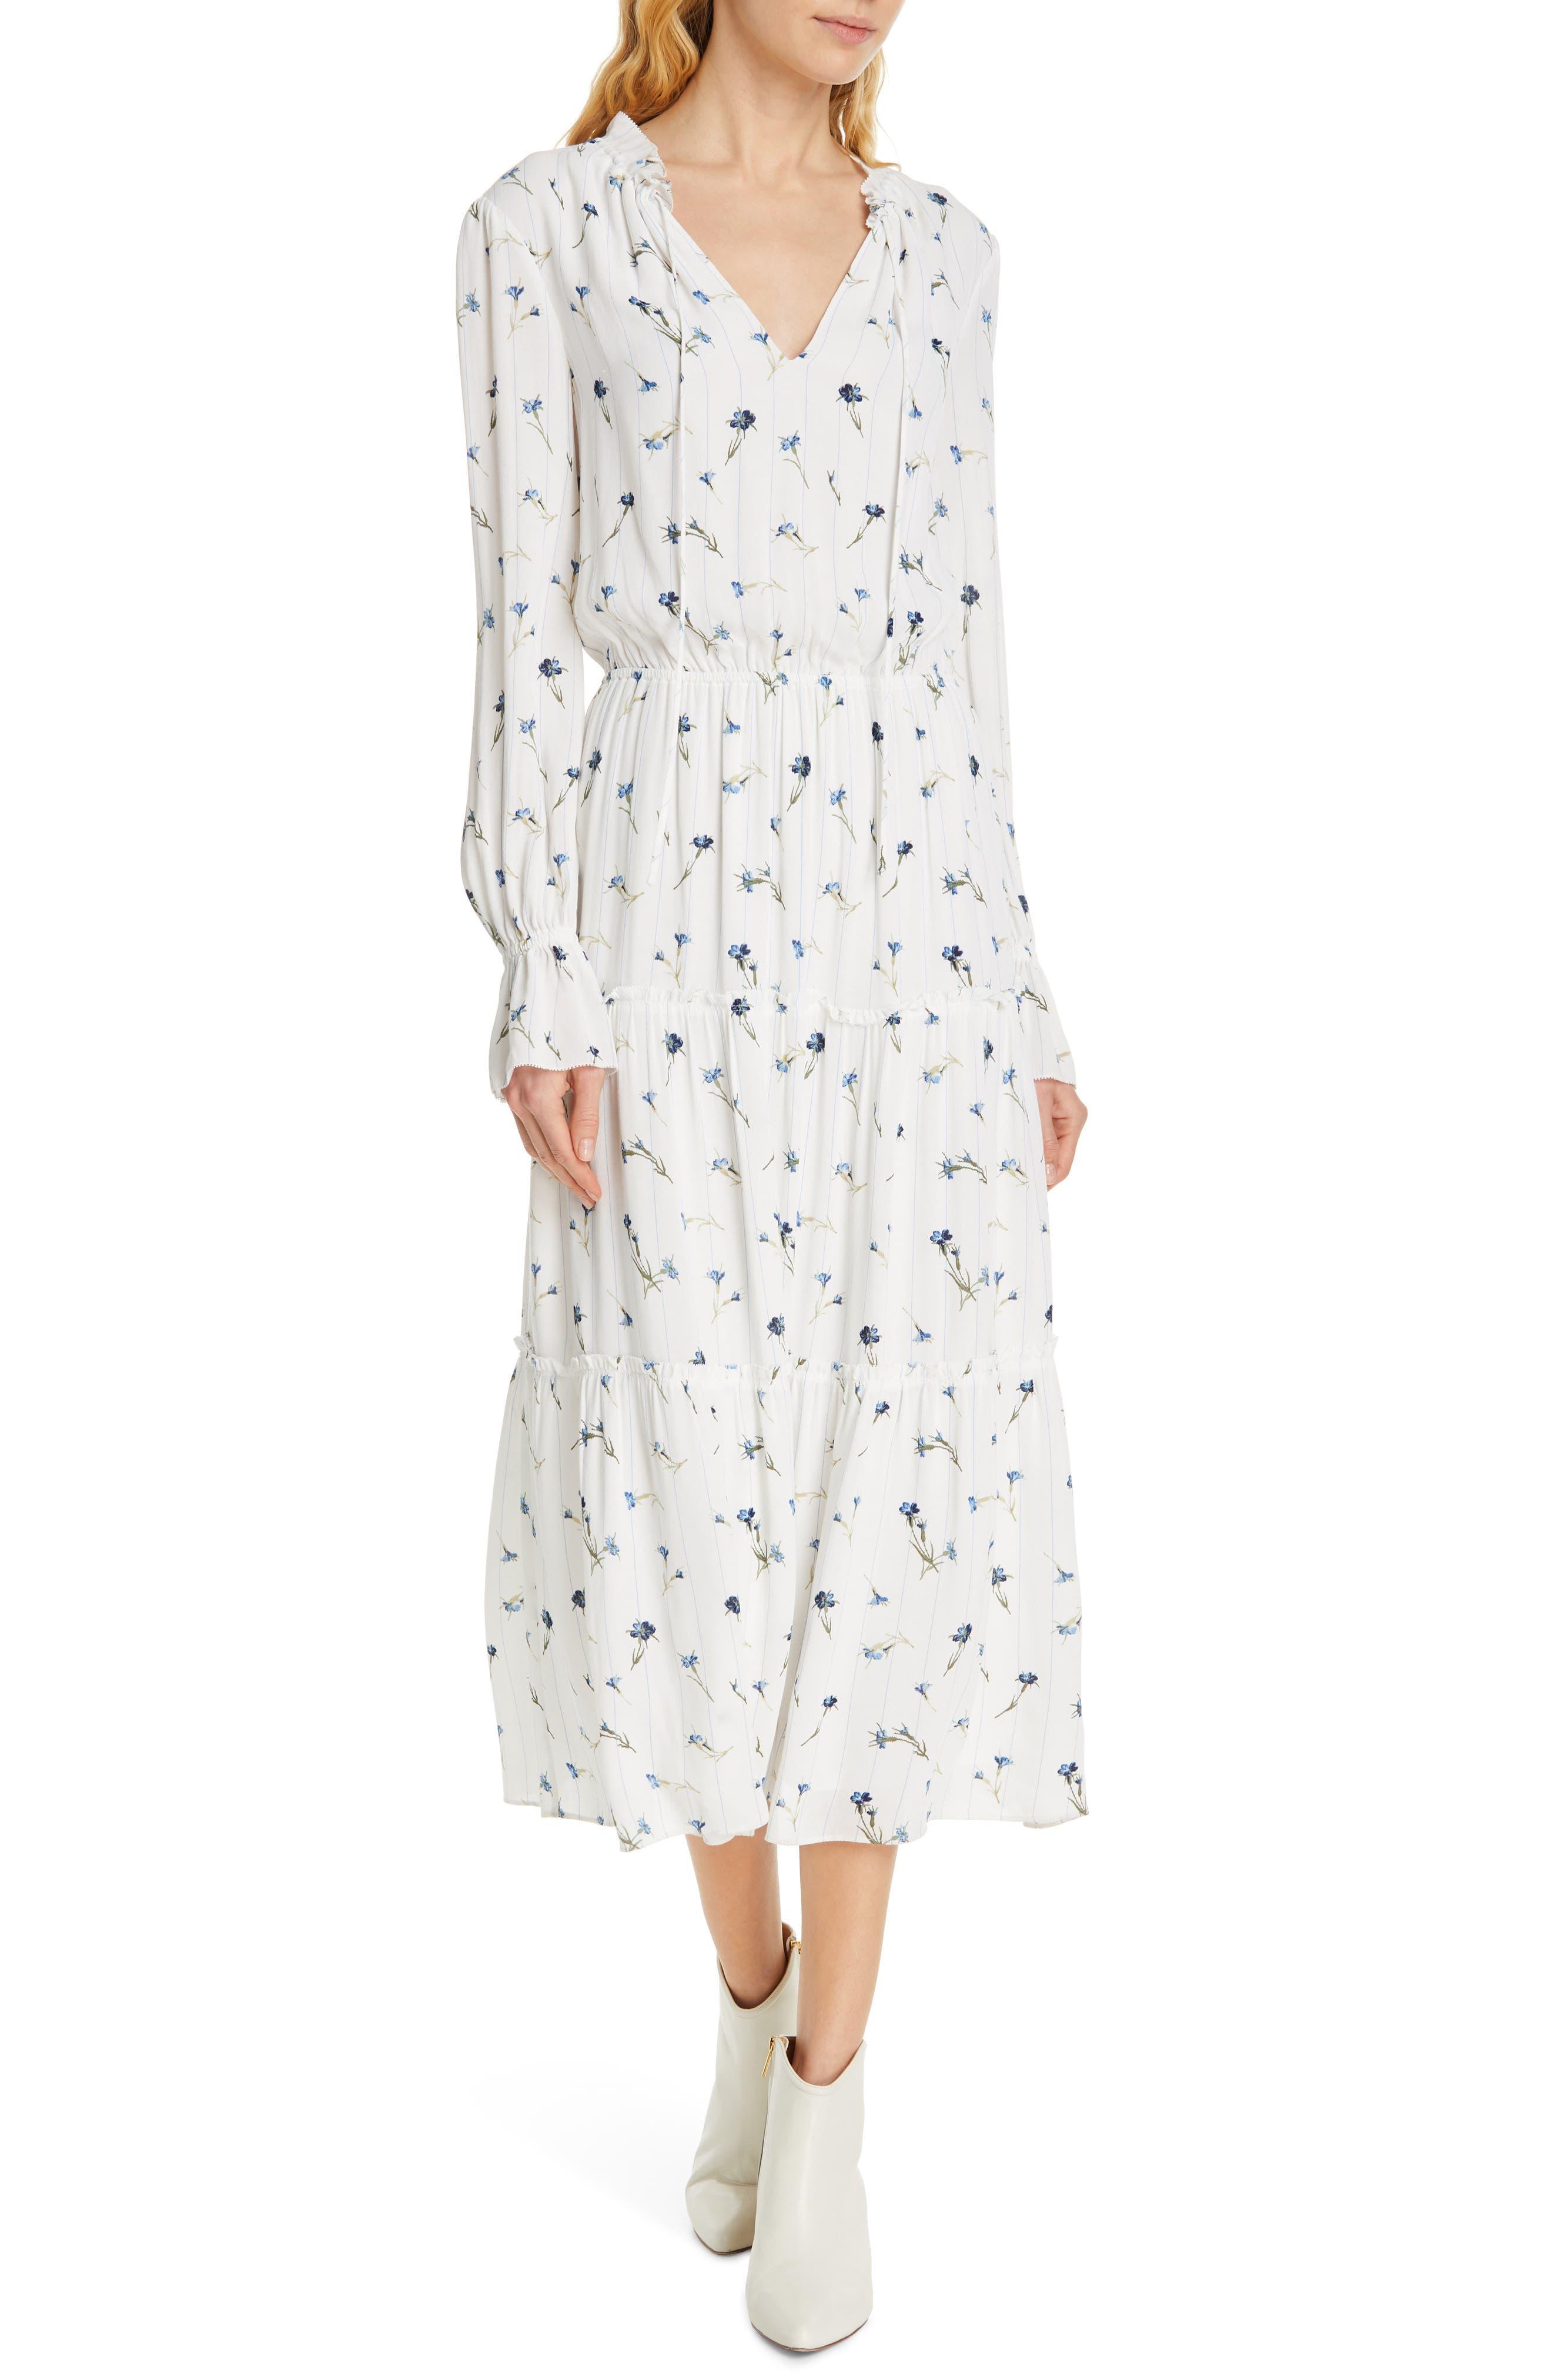 Joie Waneta Long Sleeve Midi Dress, Ivory